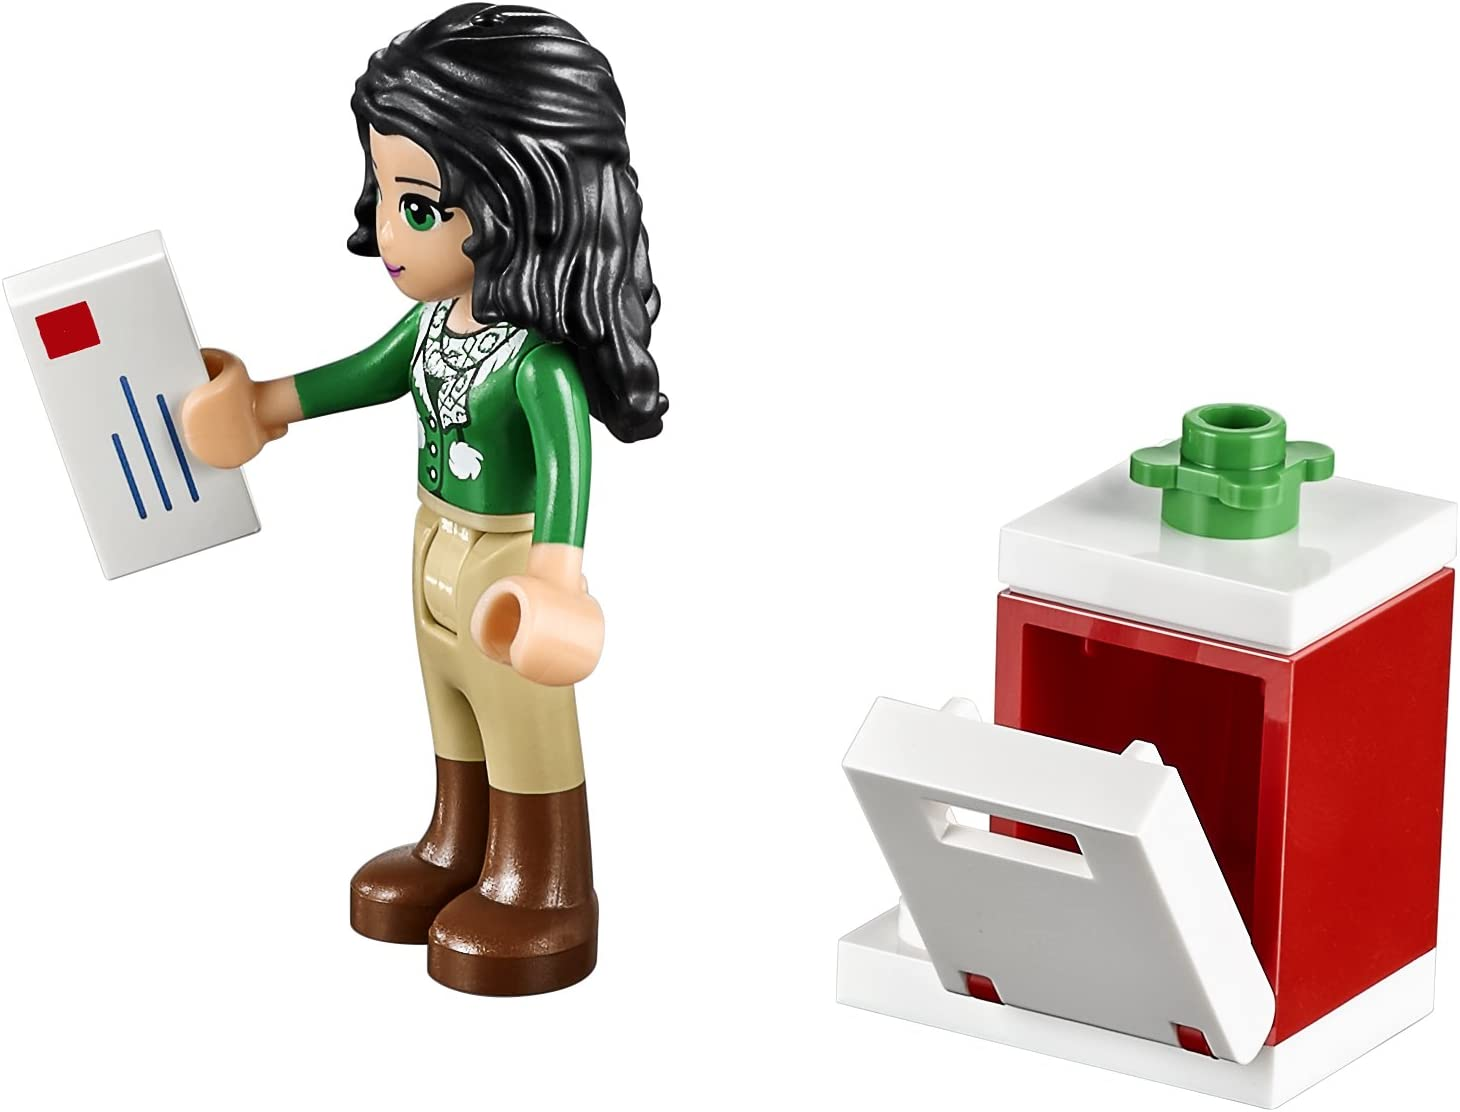 Lego Friends 41131 Advent Calendar Building Kit (218 Piece) (Discontinued by Manufacturer)